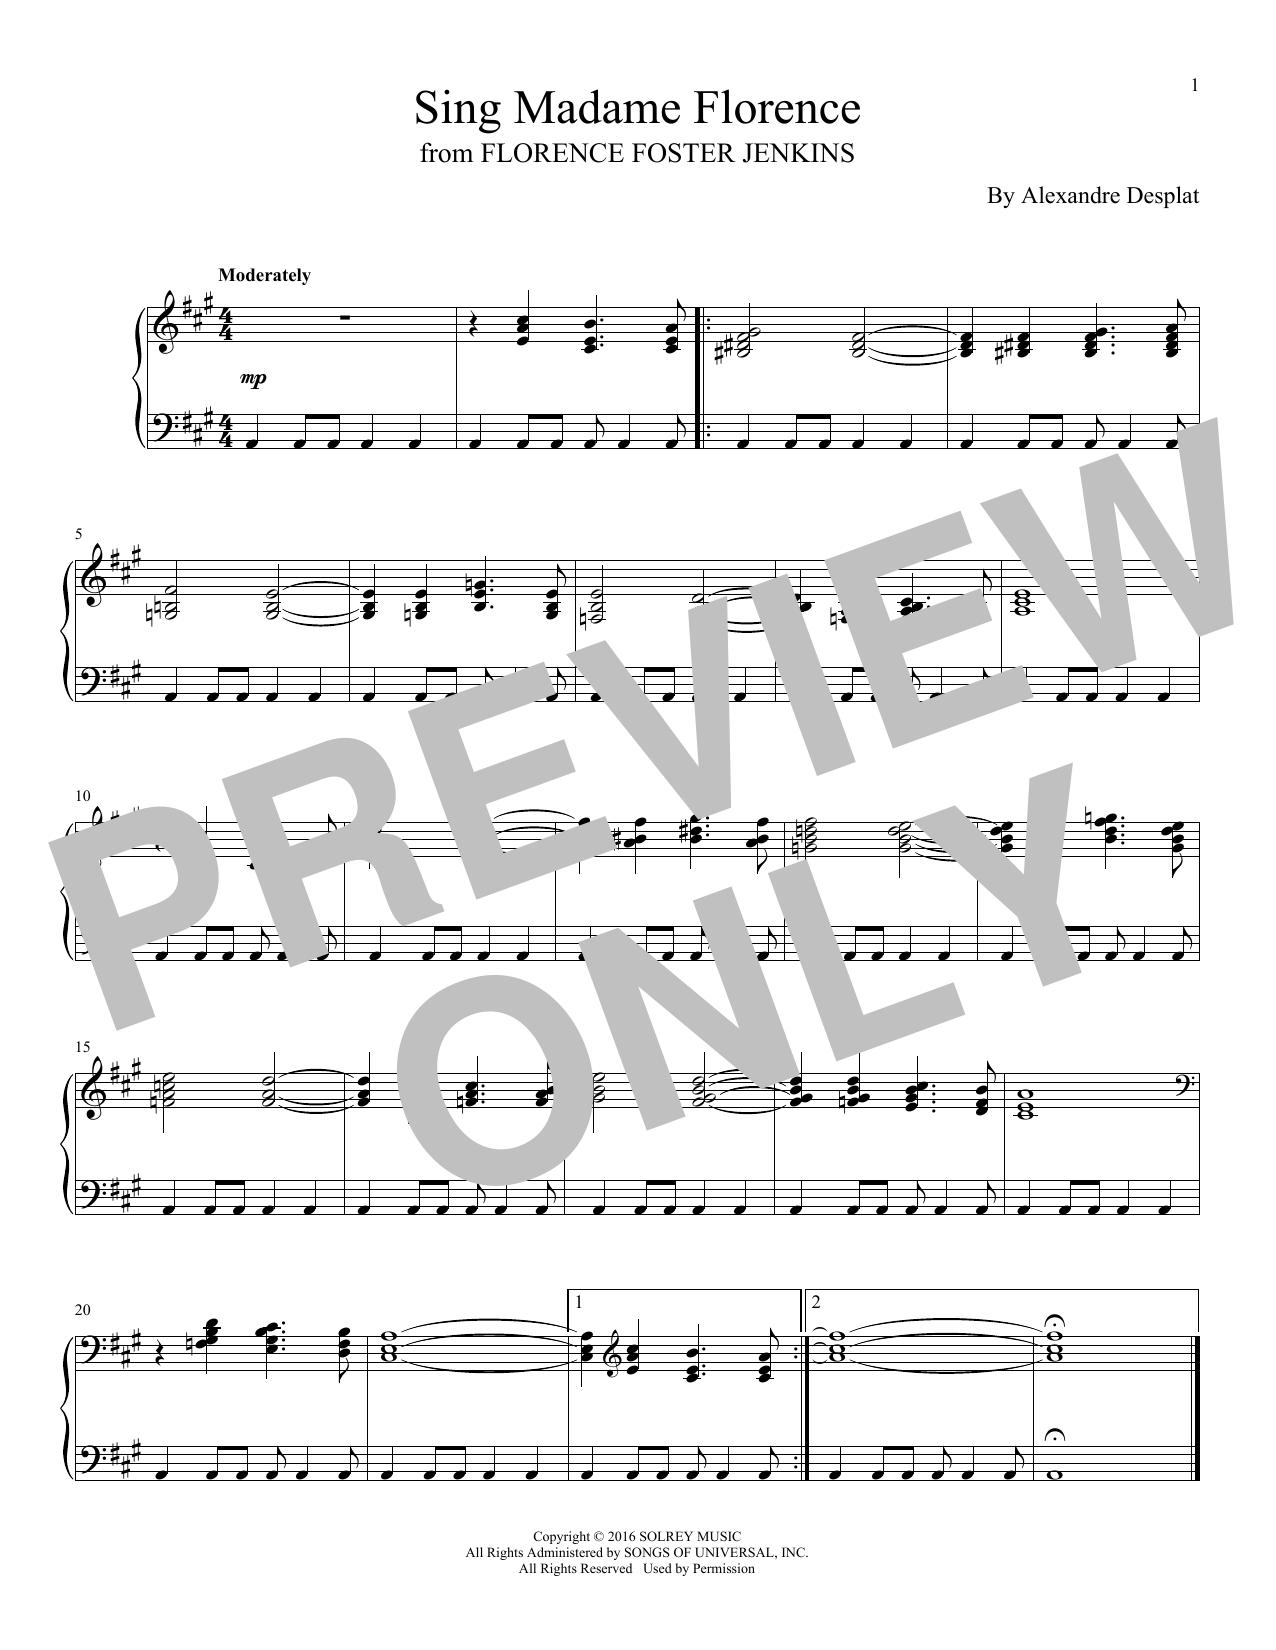 Alexandre Desplat Sing Madame Florence sheet music notes and chords. Download Printable PDF.